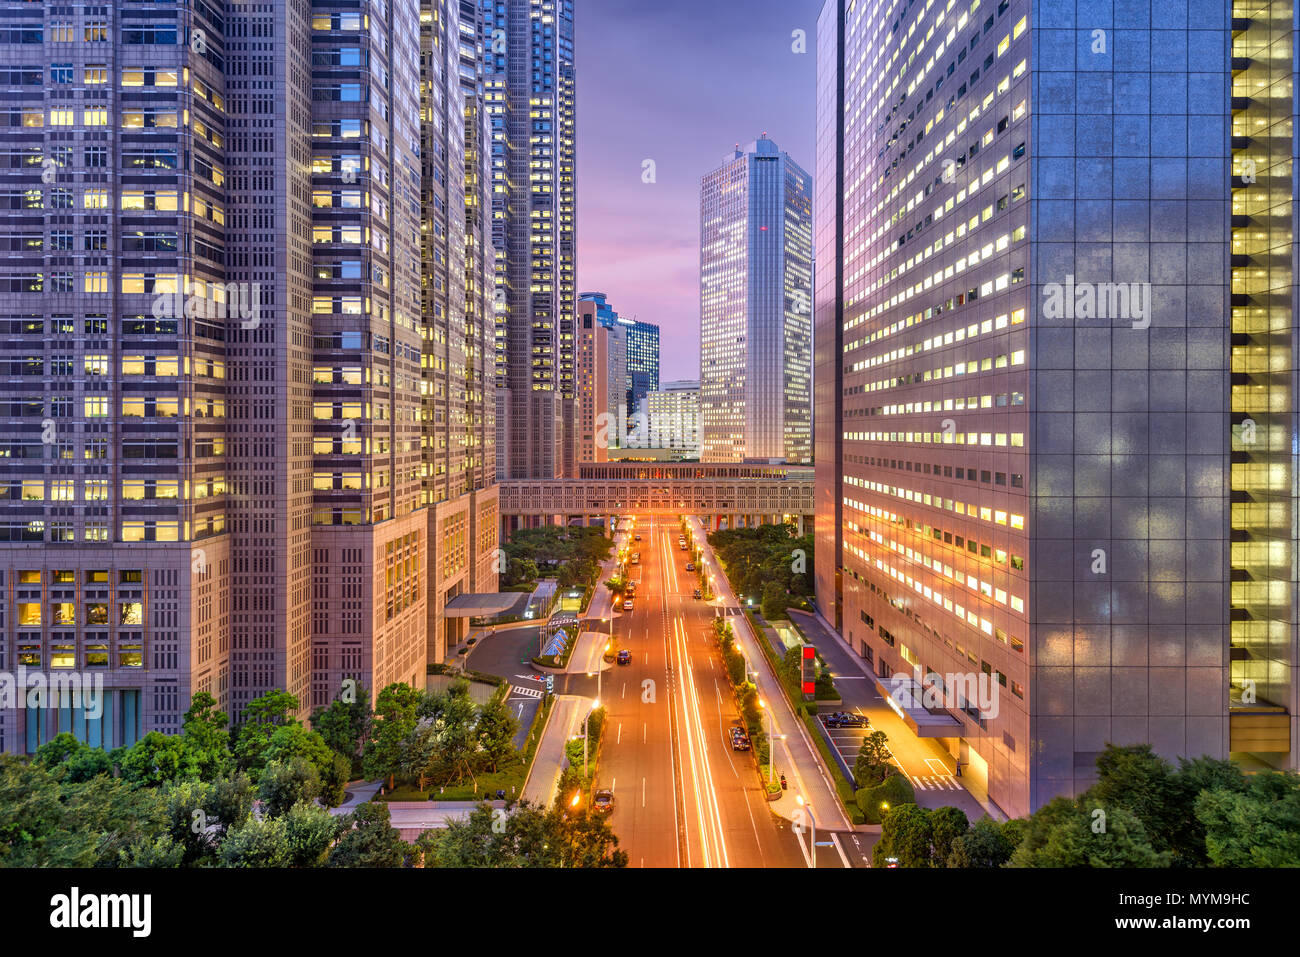 Shinjuku, Tokyo, Japan cityscape throught the Metropolitan Goverment Buildings at dusk. - Stock Image